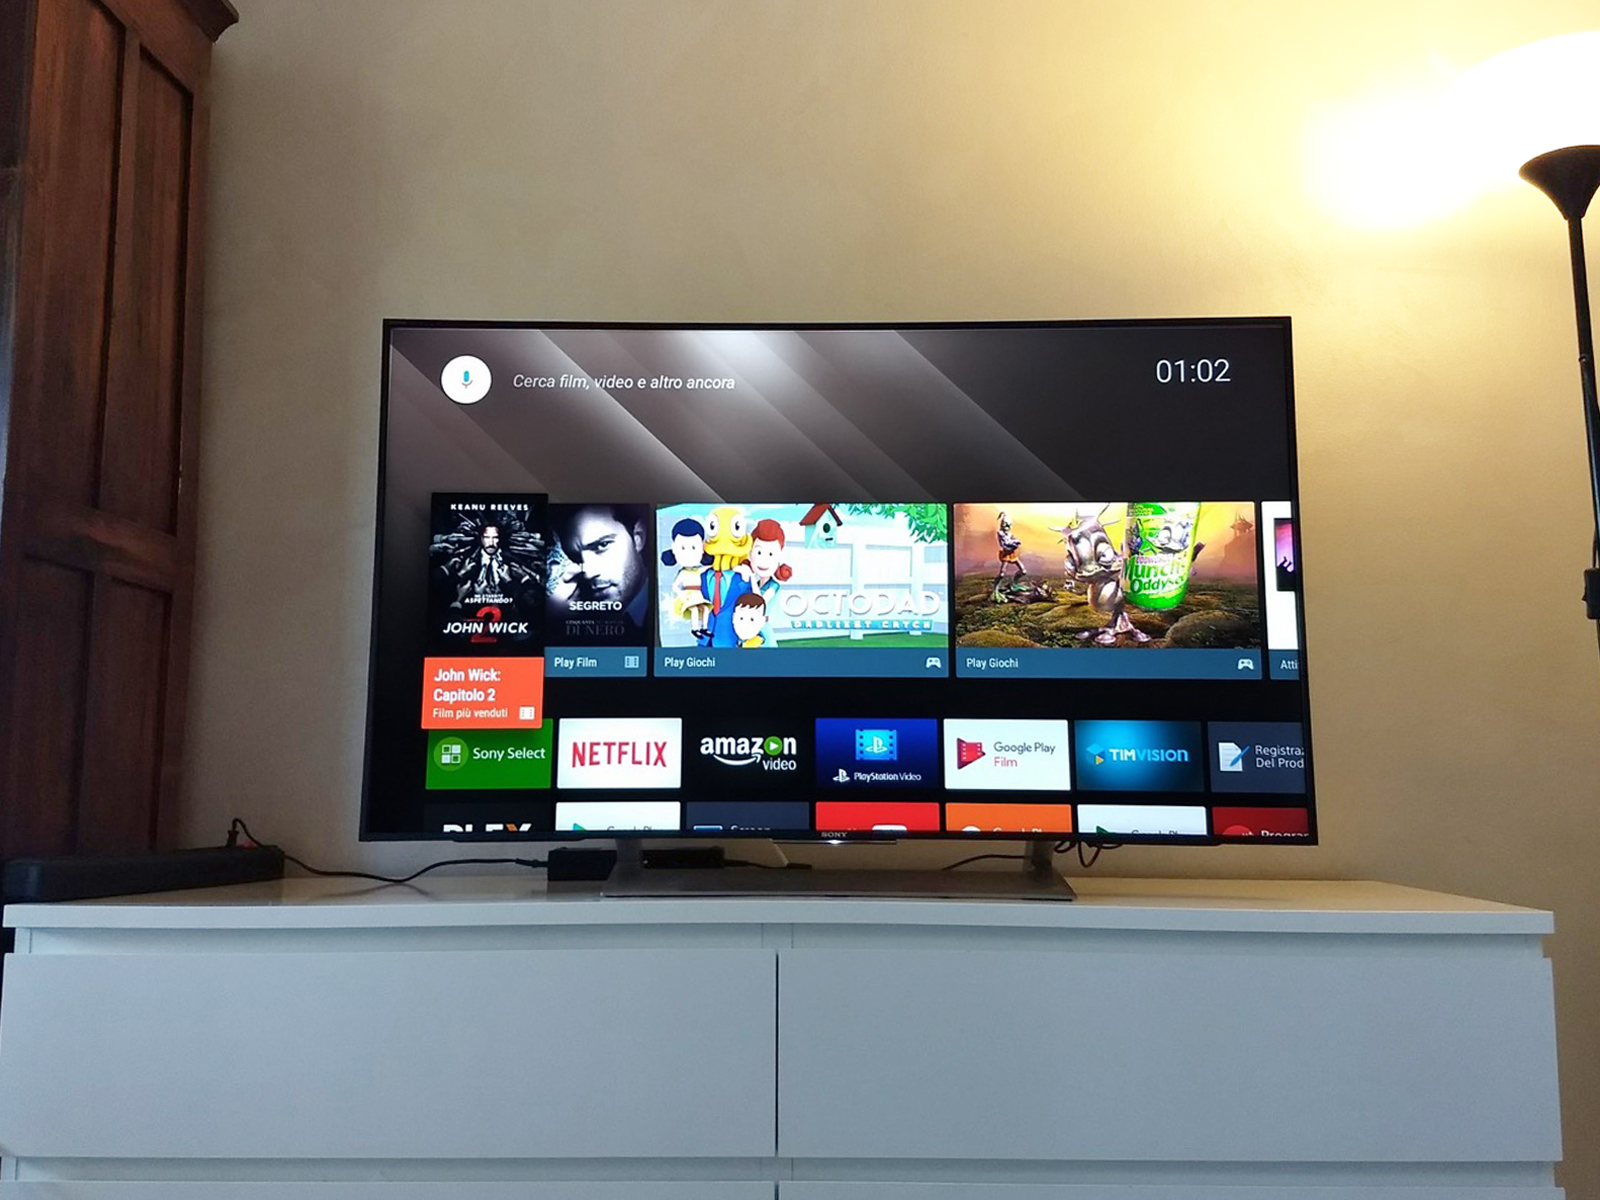 app timvision su smart tv sony